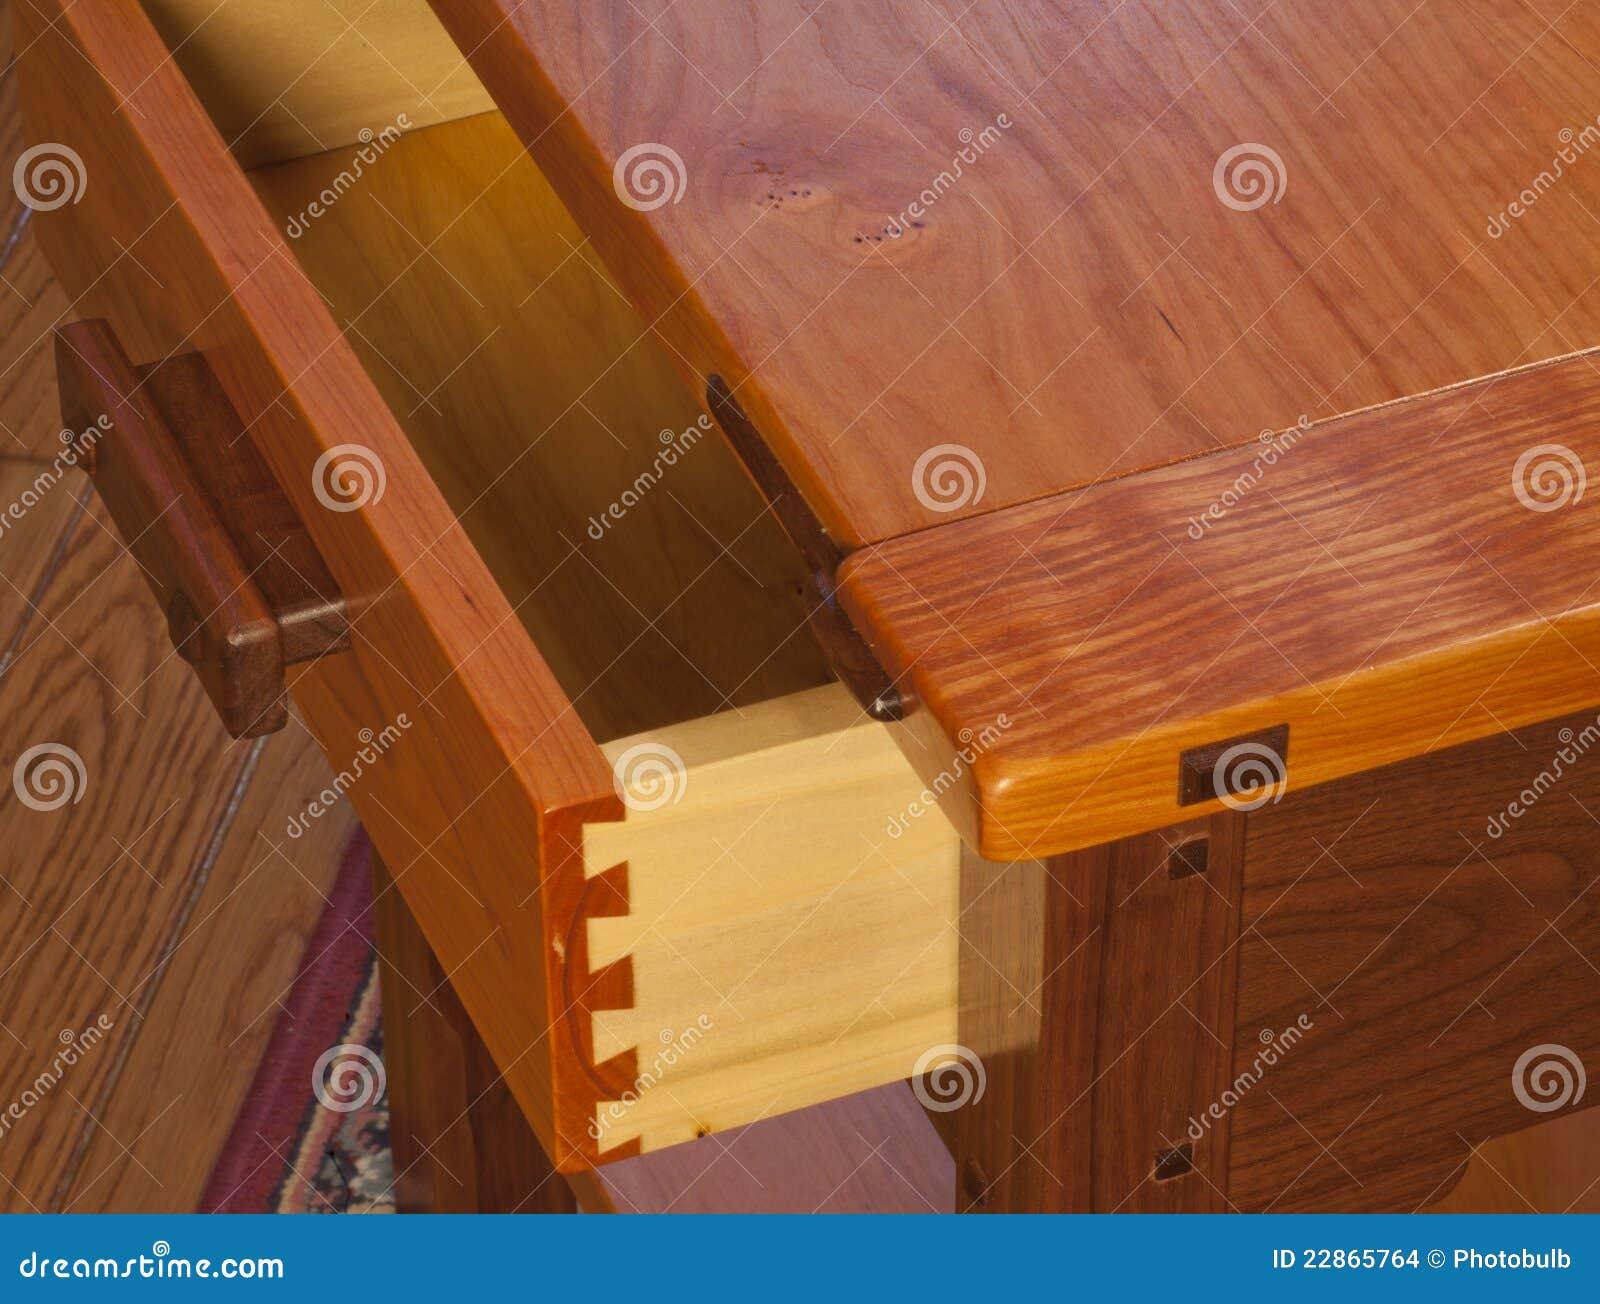 Carpinter a de madera de la cola de pato imagenes de for Carpinteria en madera